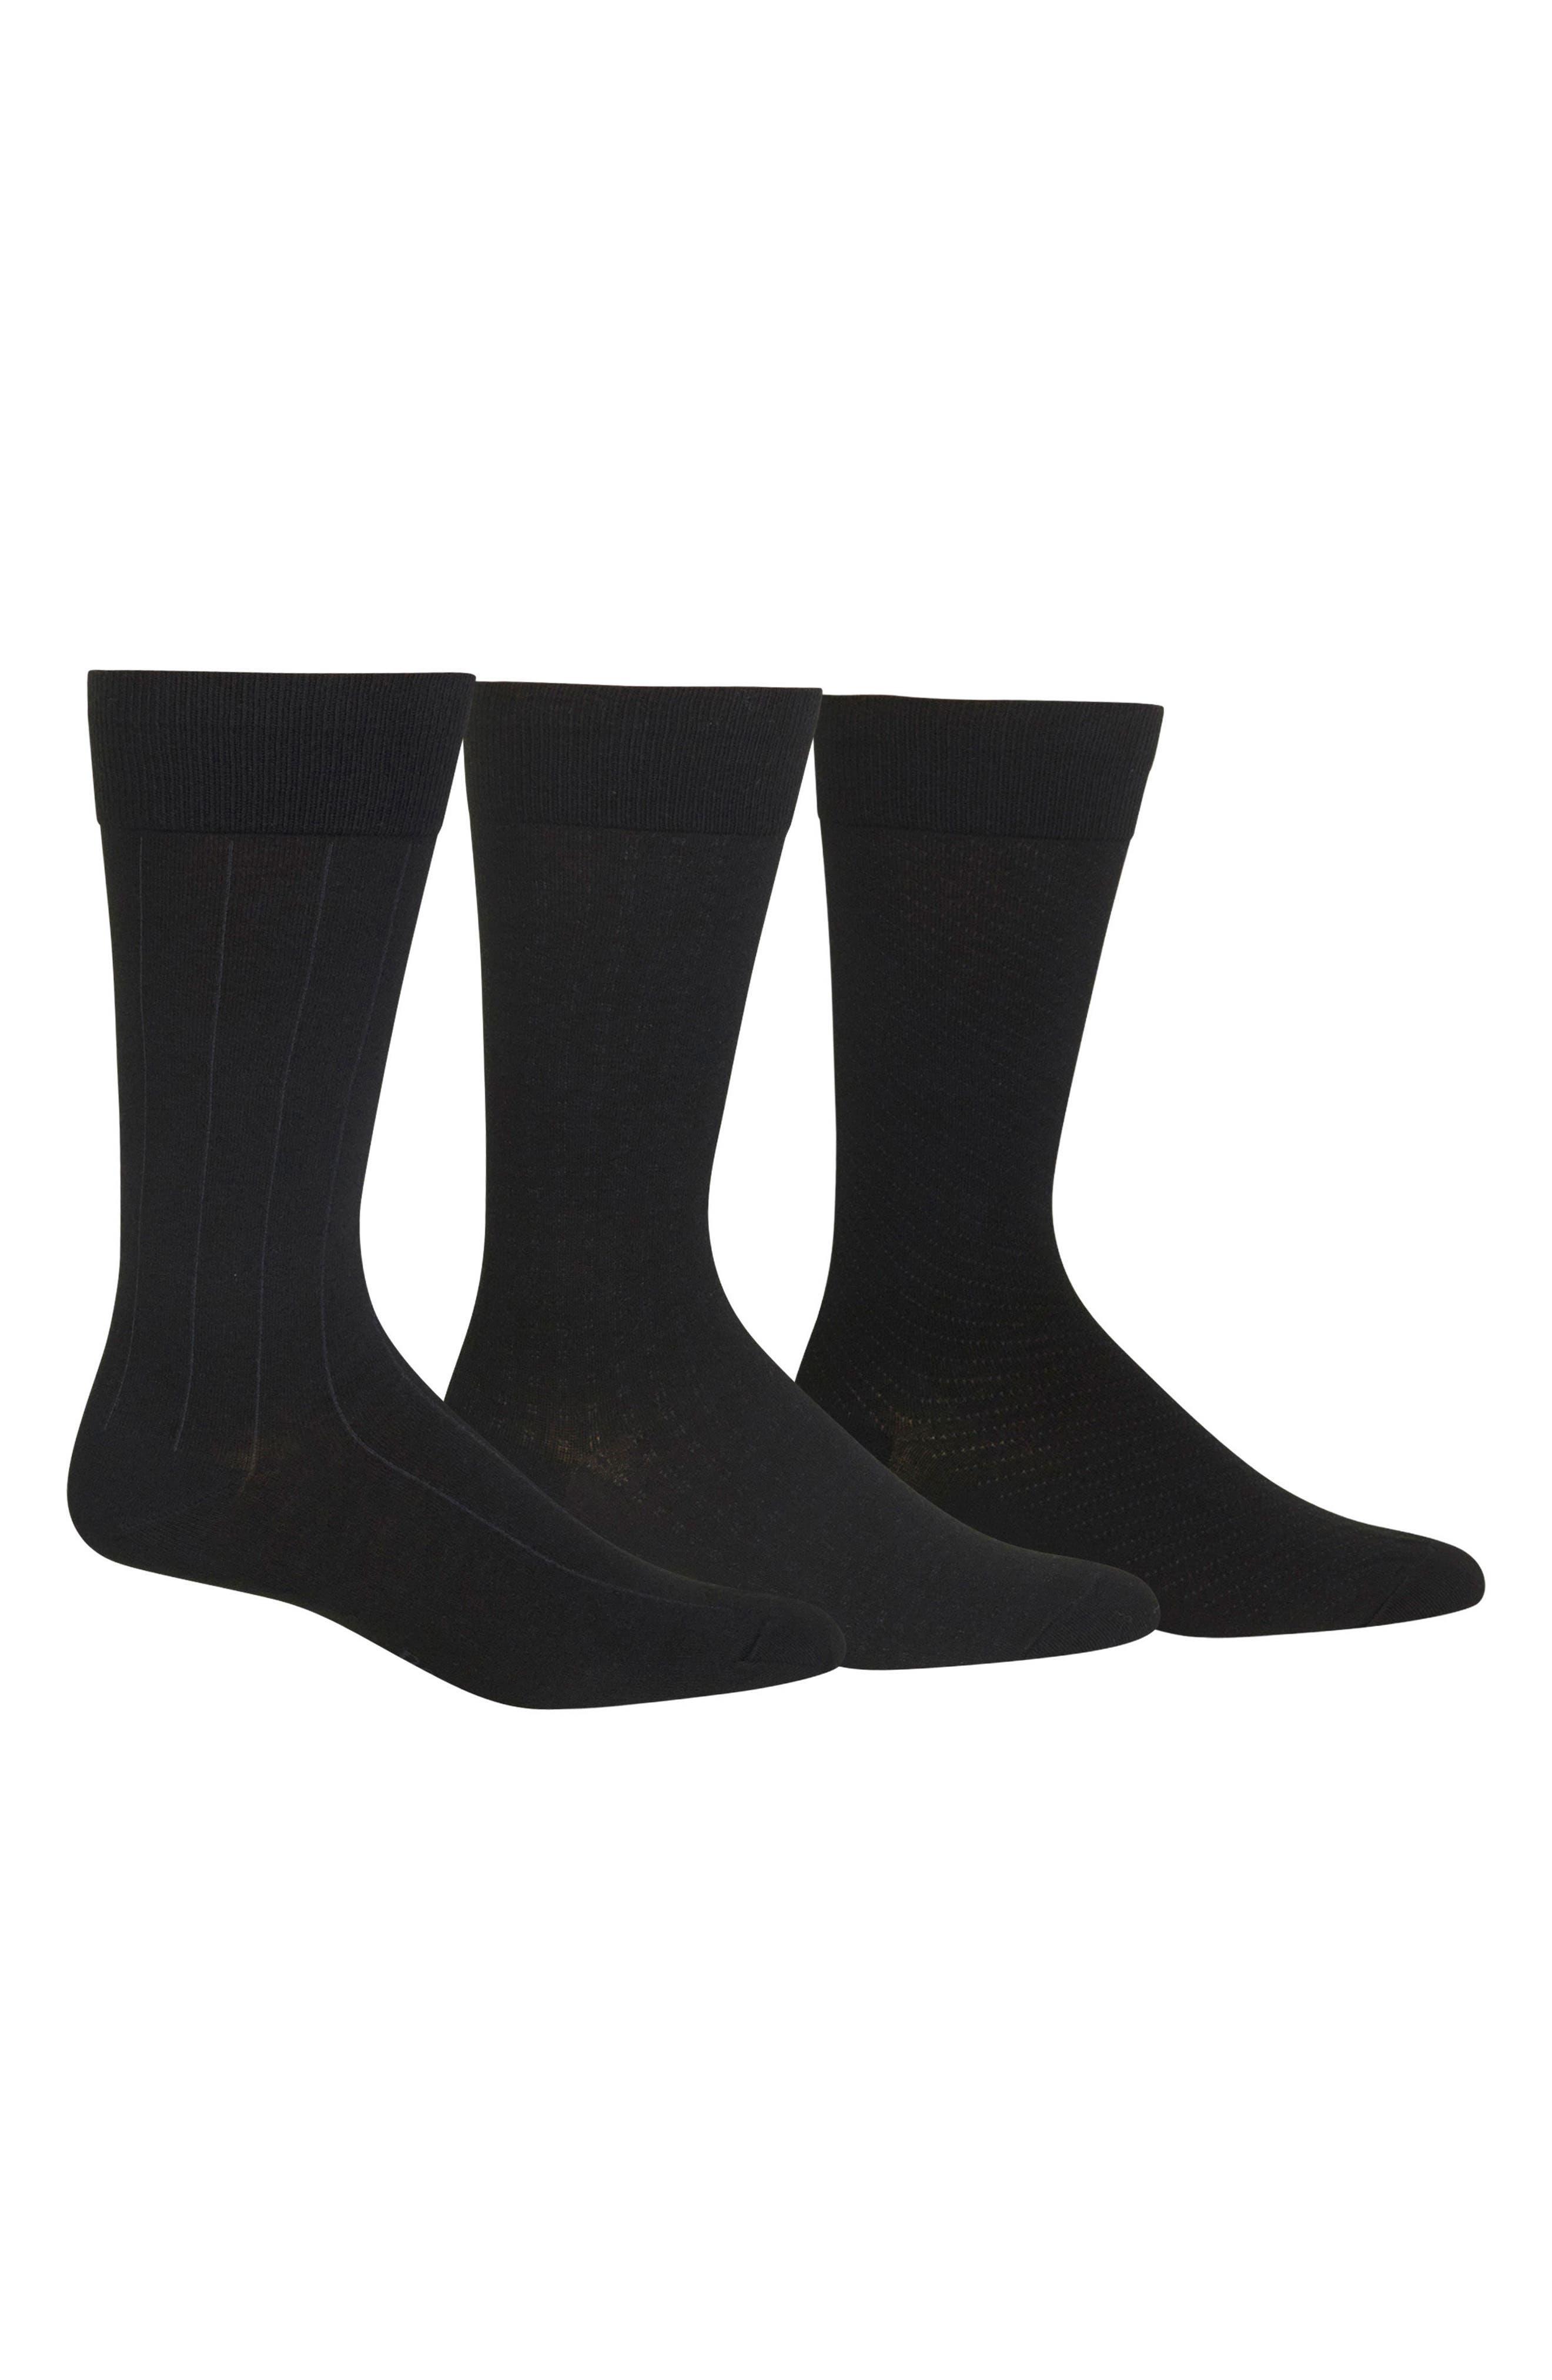 POLO RALPH LAUREN Dress Socks, Main, color, BLACK